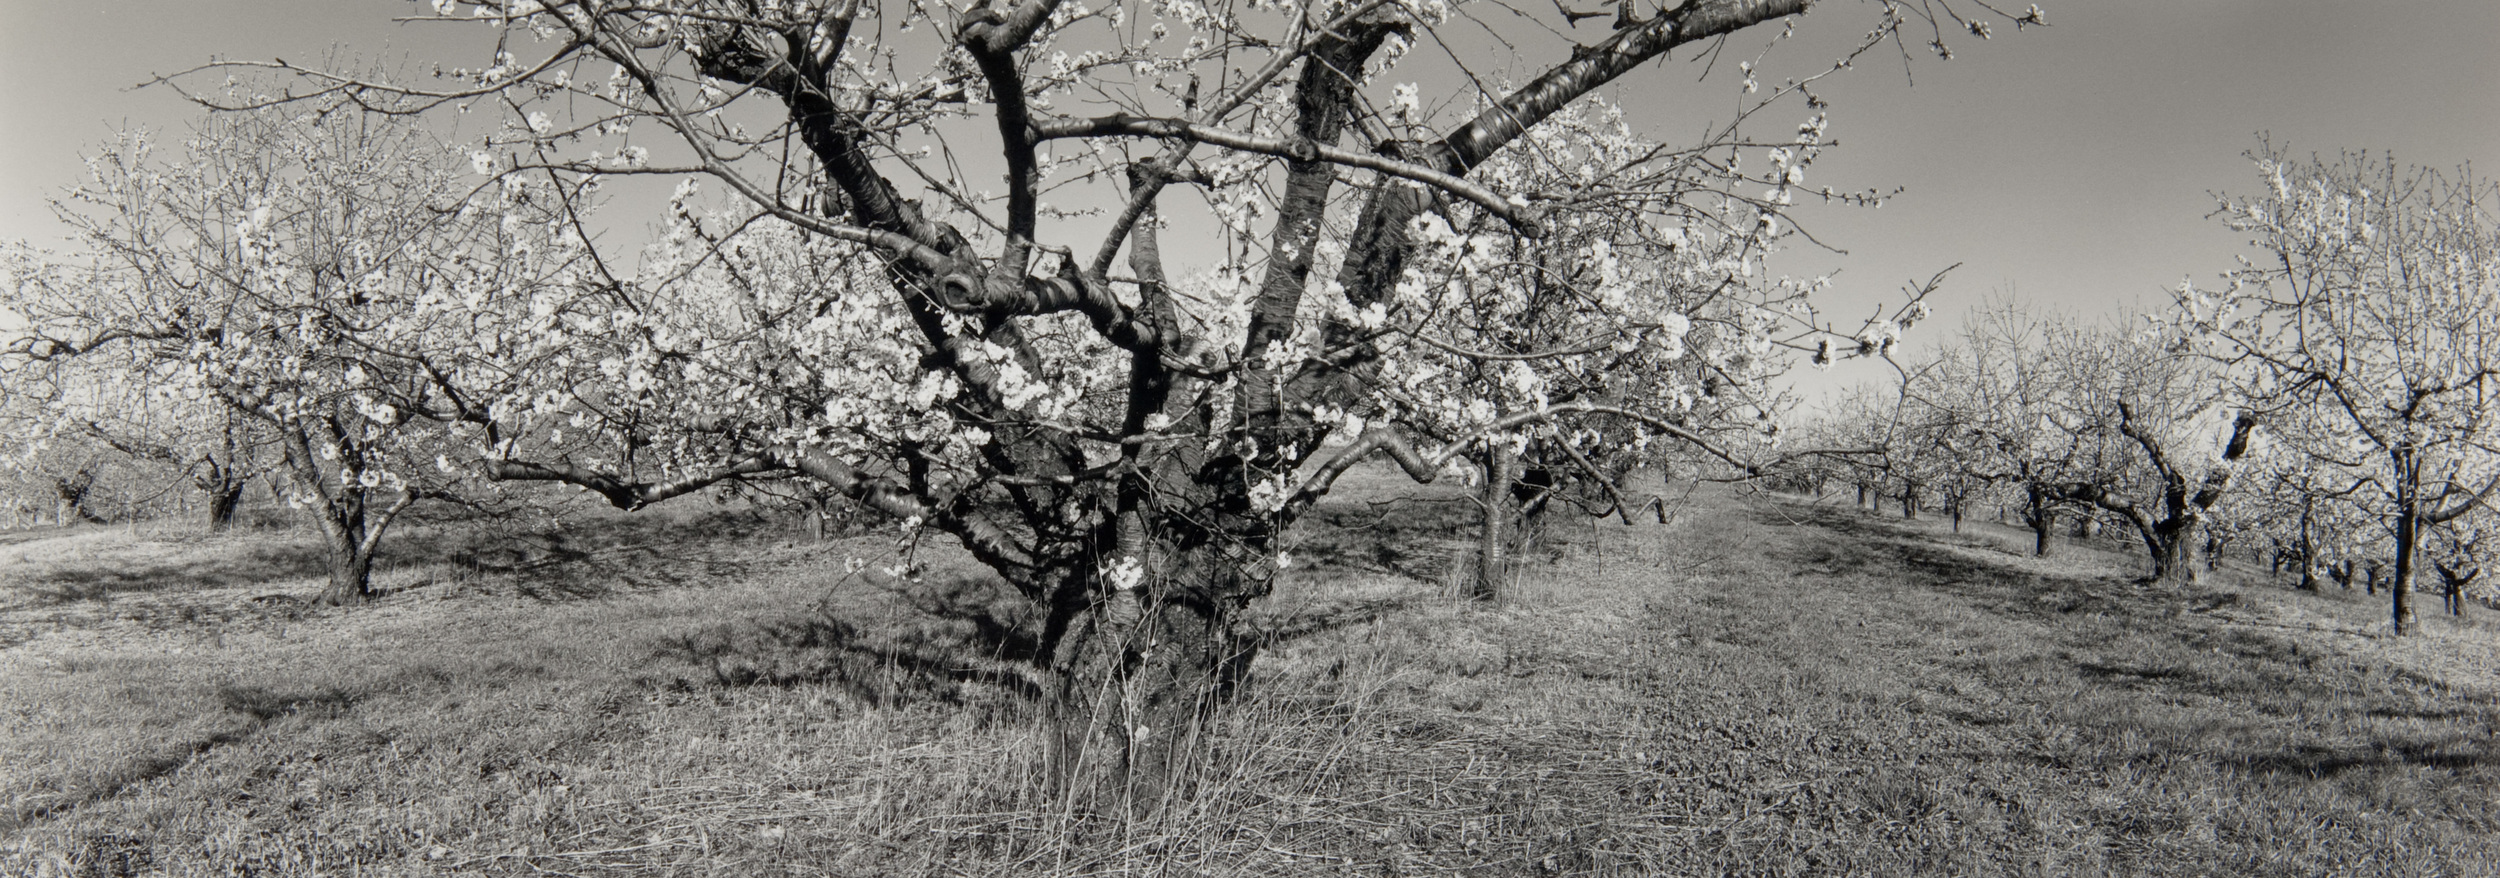 E. Lindbloom, Apple Orchard, Milton, 1998, gelatin silver print.jpg